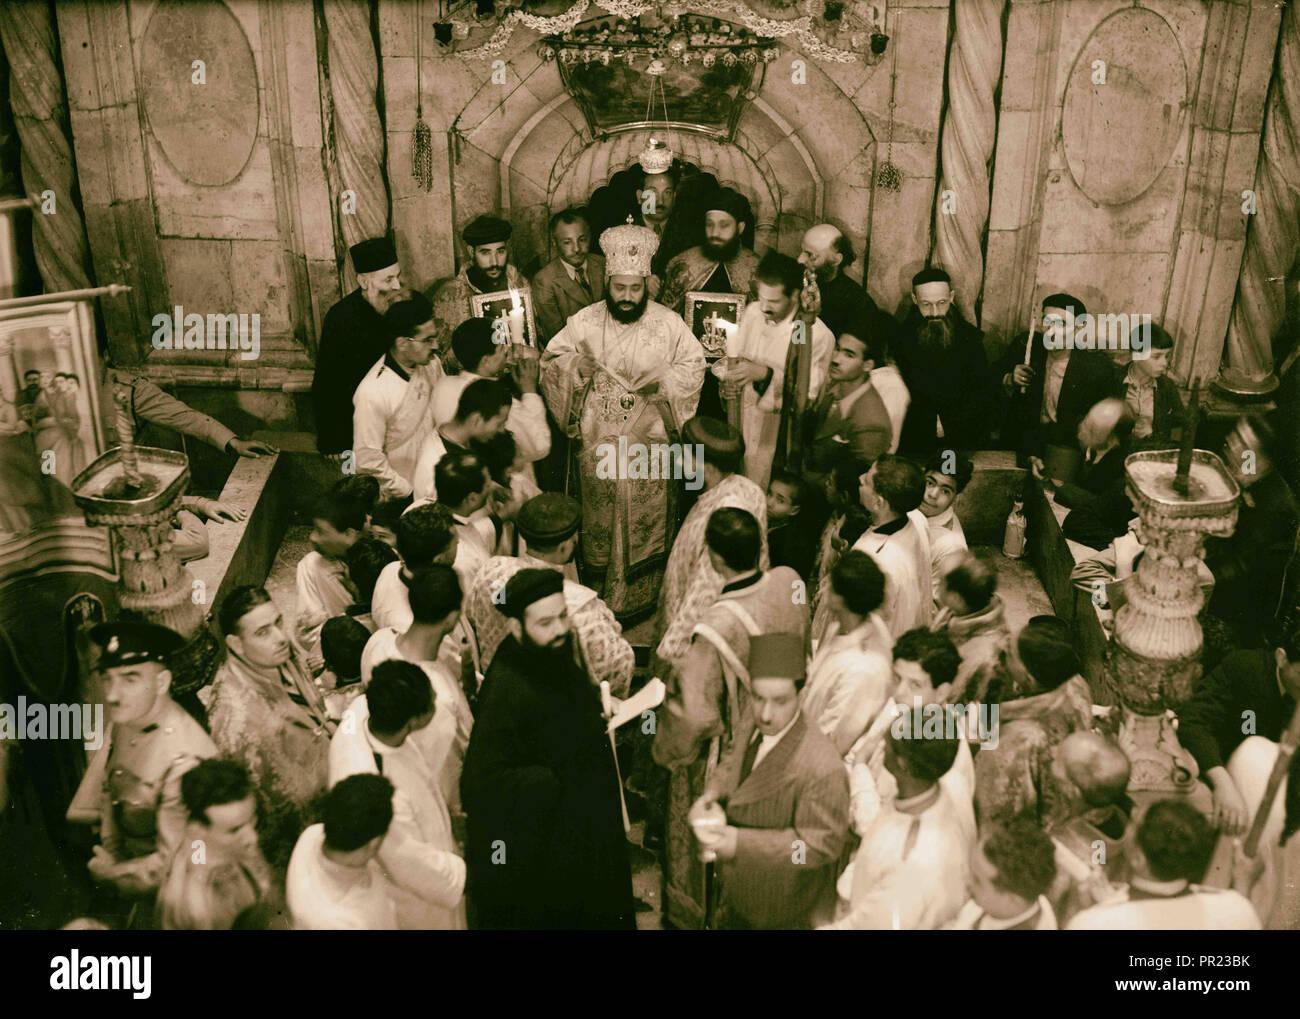 Calendar of religious ceremonies in Jerusalem Easter period 1941 1941, Jerusalem, Israel - Stock Image